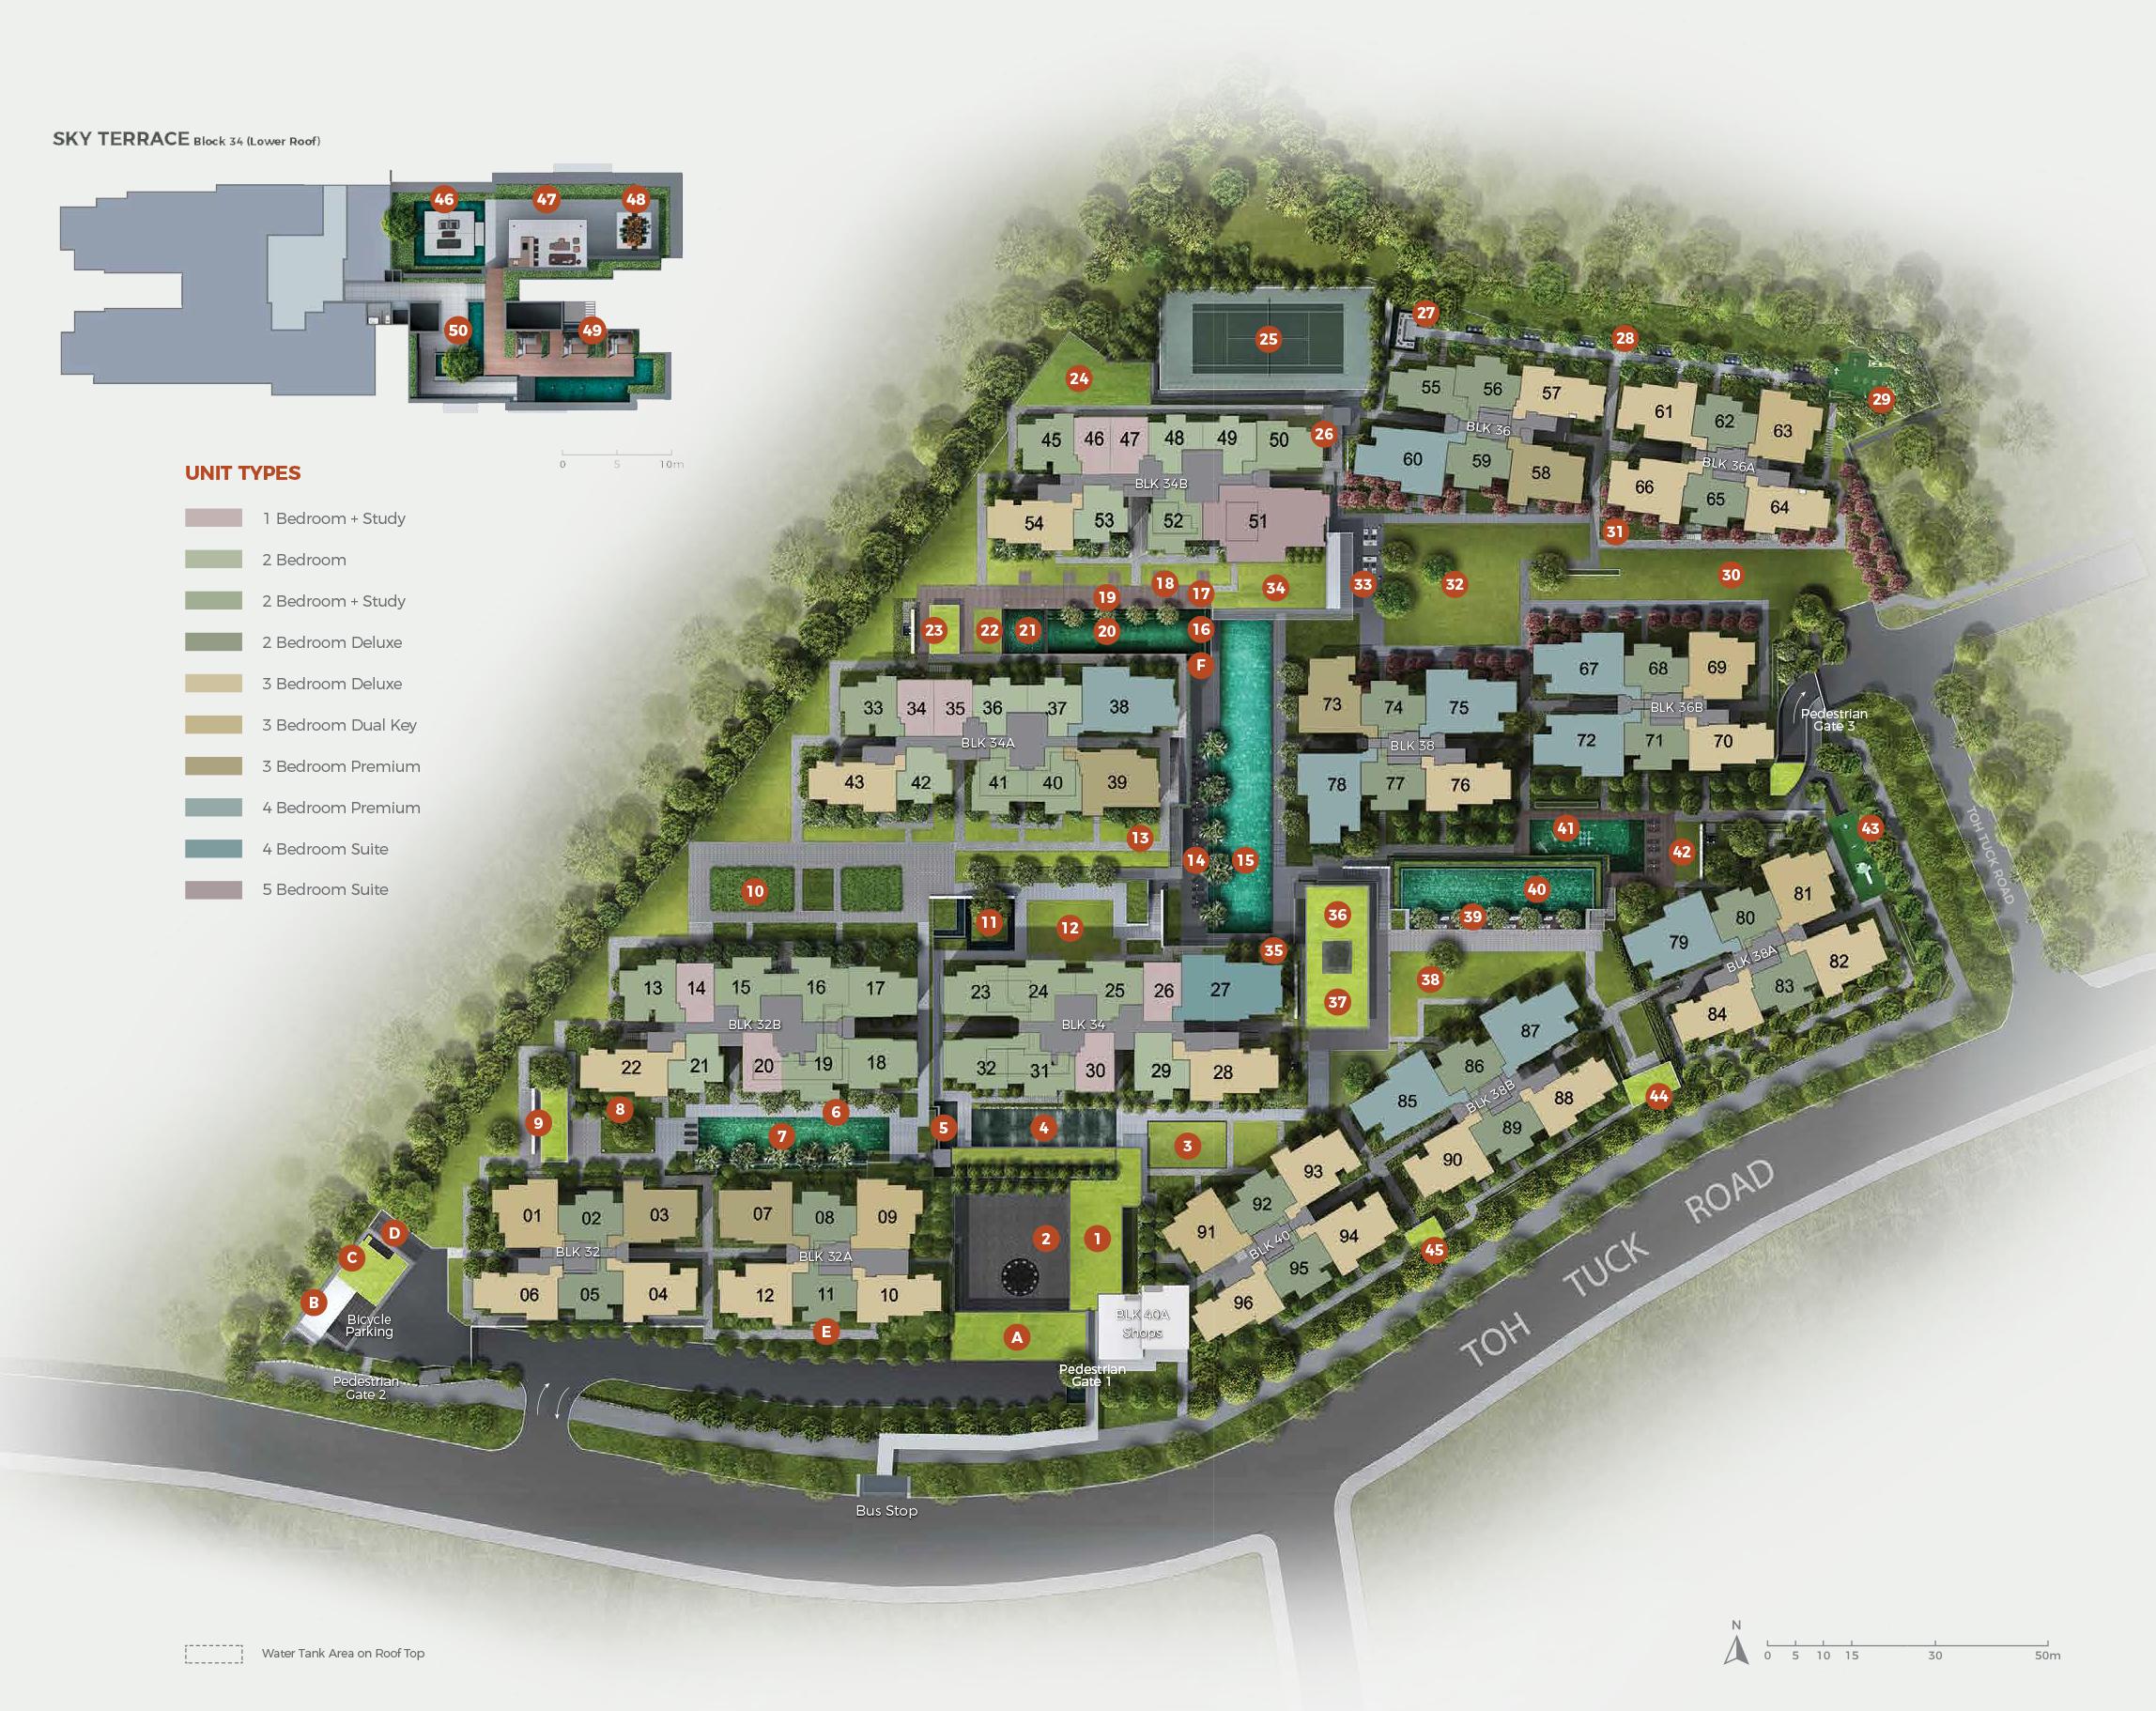 Site Plan of Forett at Bukit Timah